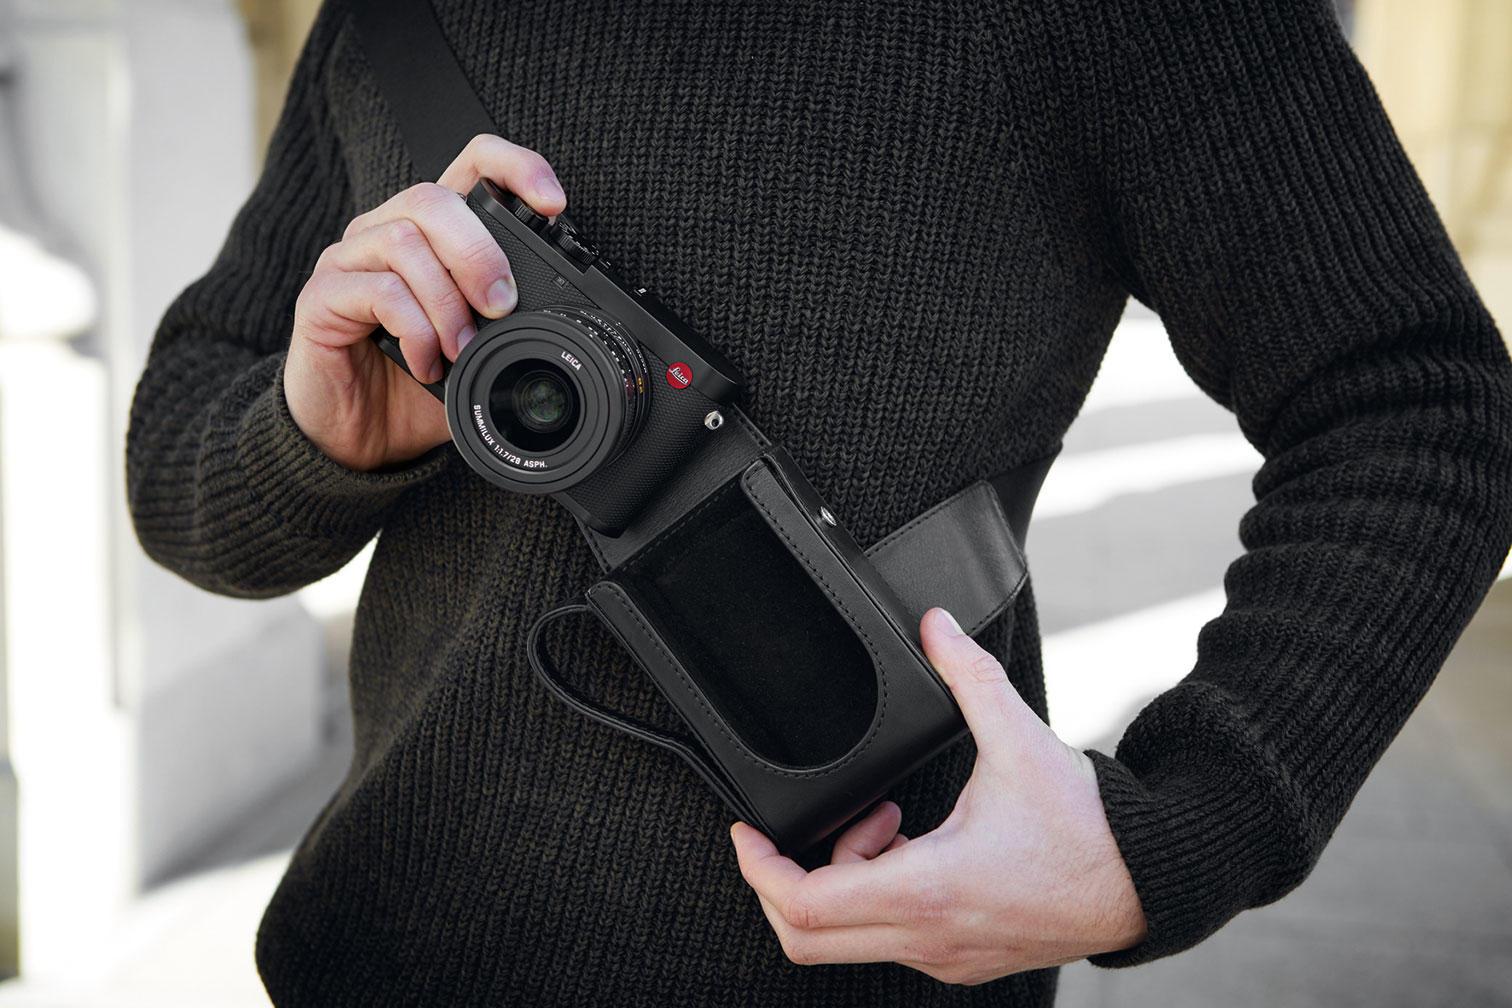 Leica Q2 camera accessories